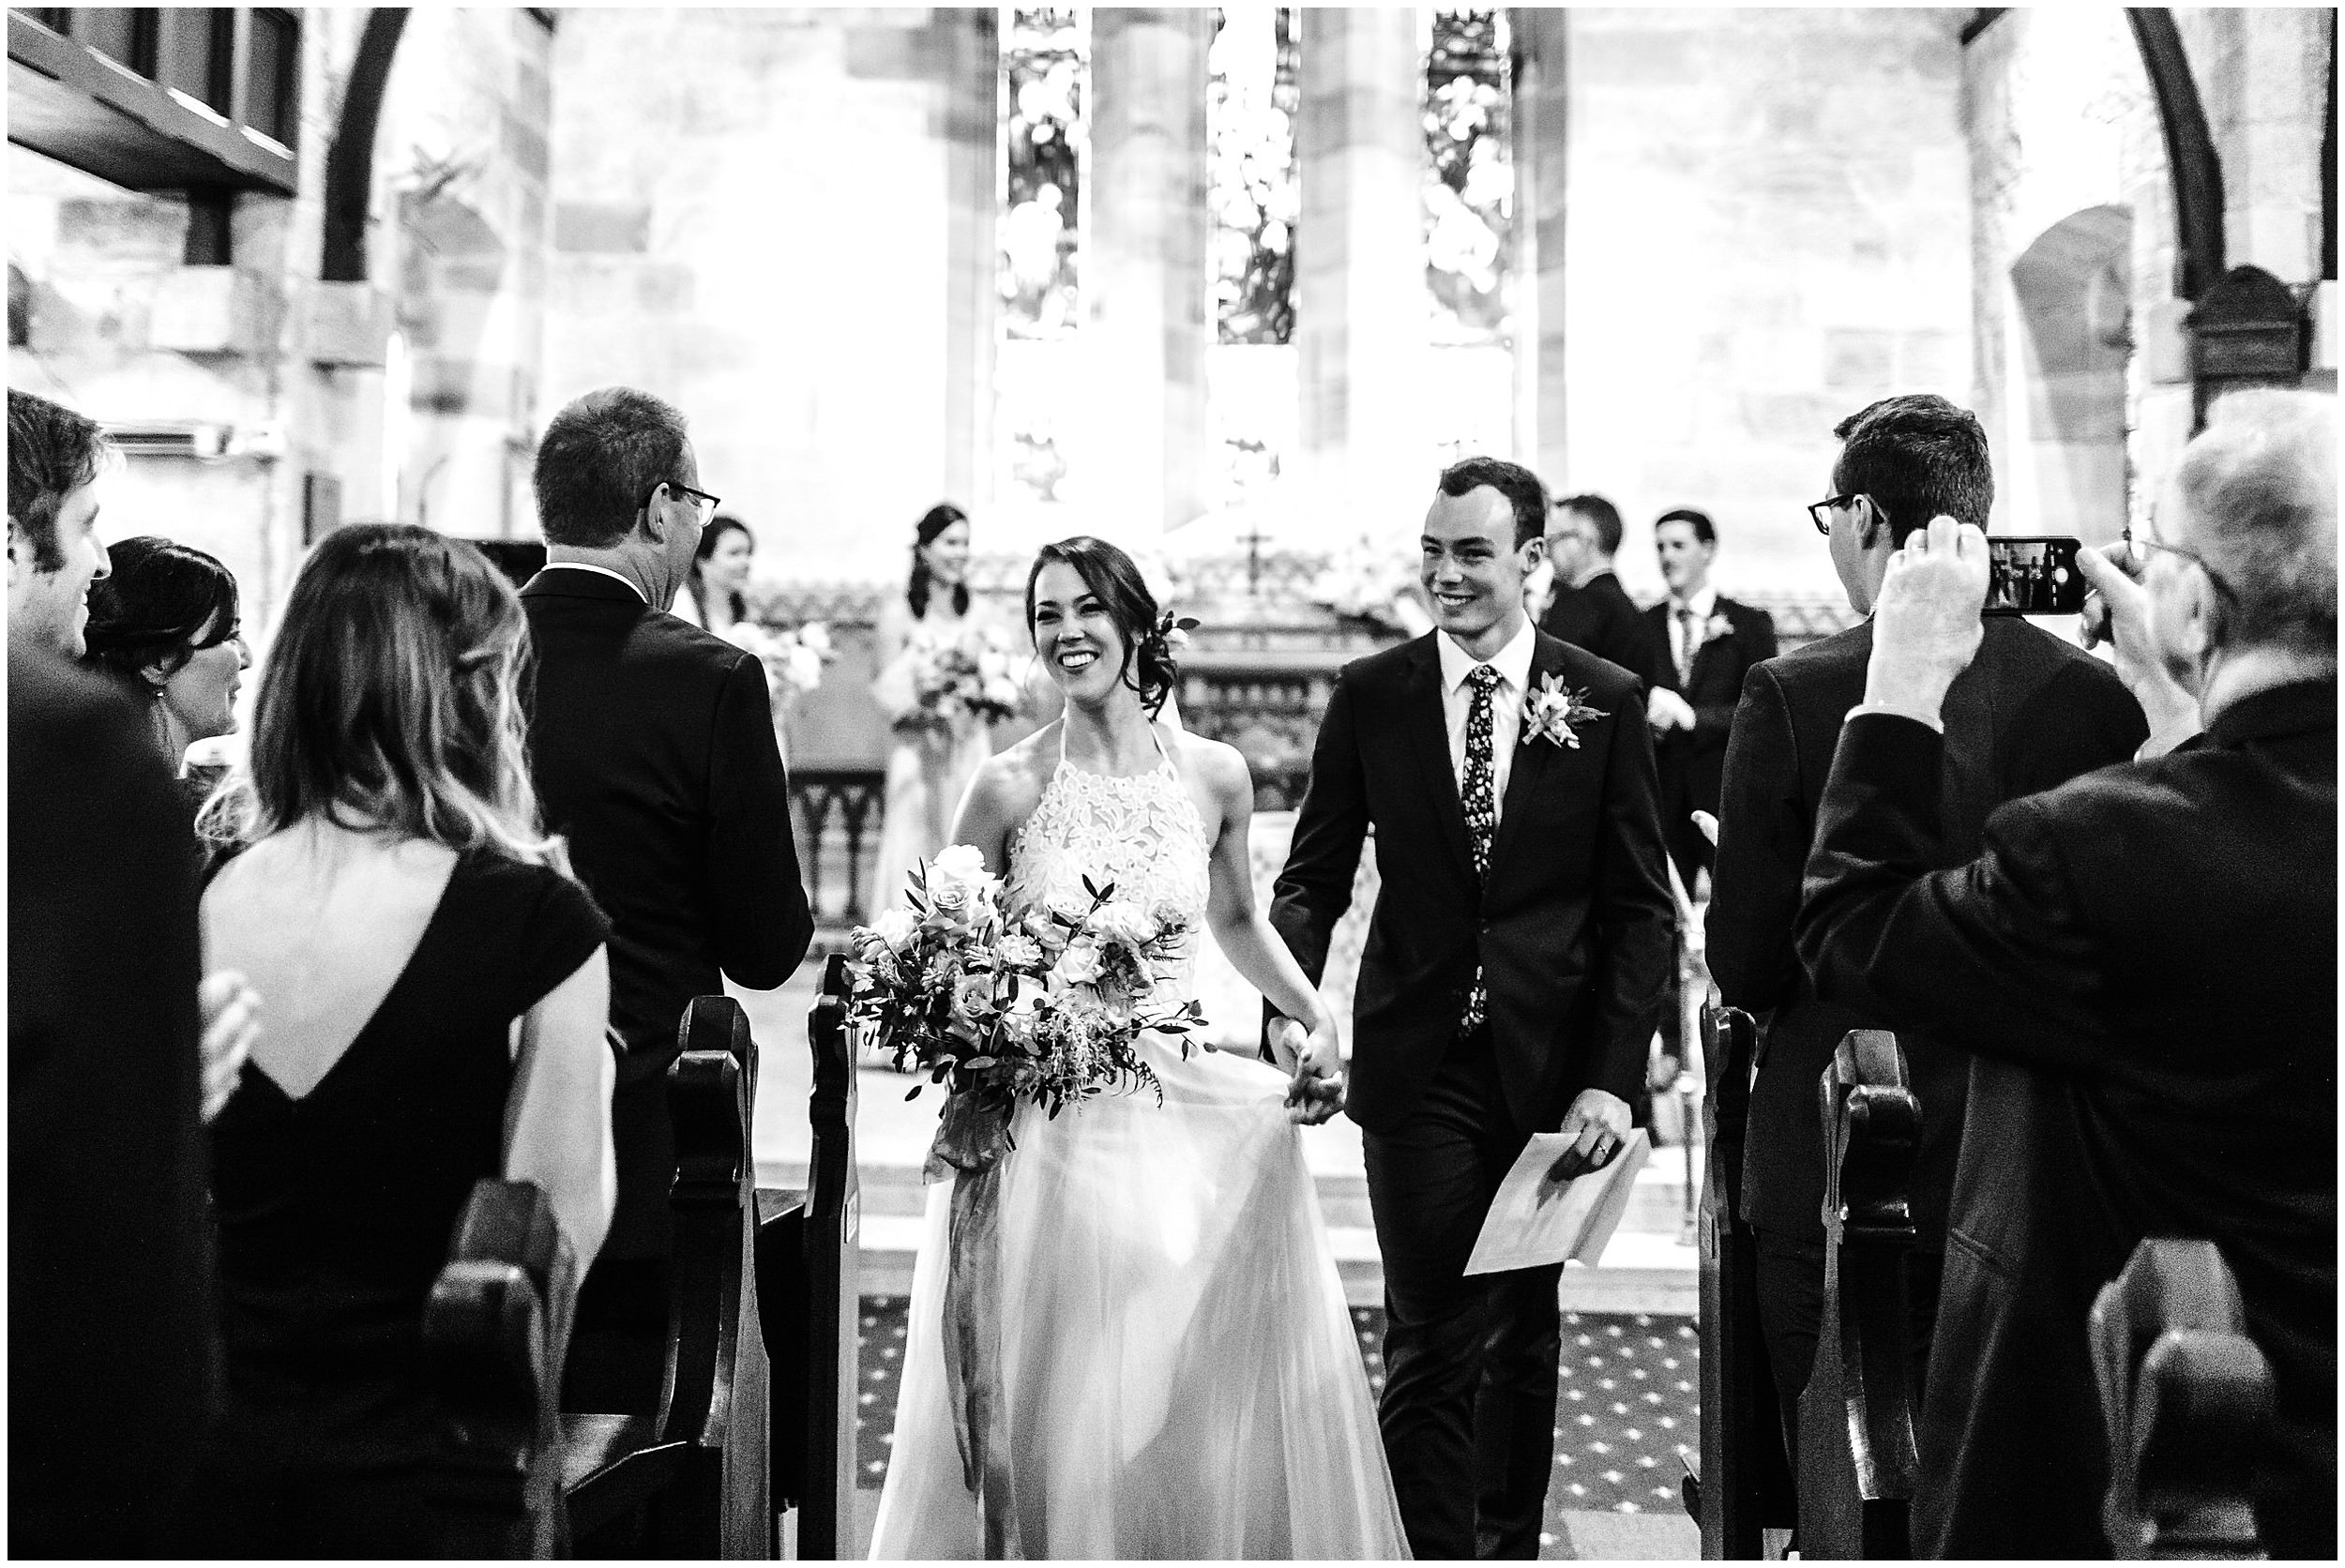 wedding_the_woolshed_steph_zac_0031.jpg